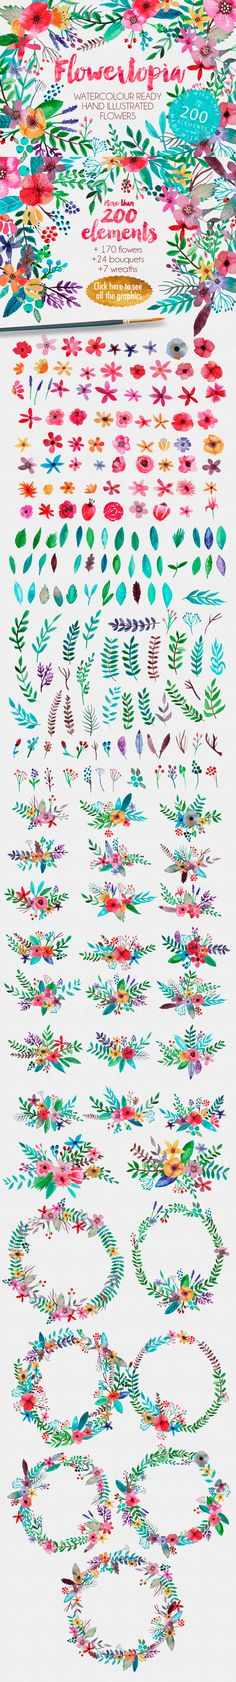 clip art feminine watercolor flowers floral hand illustrations